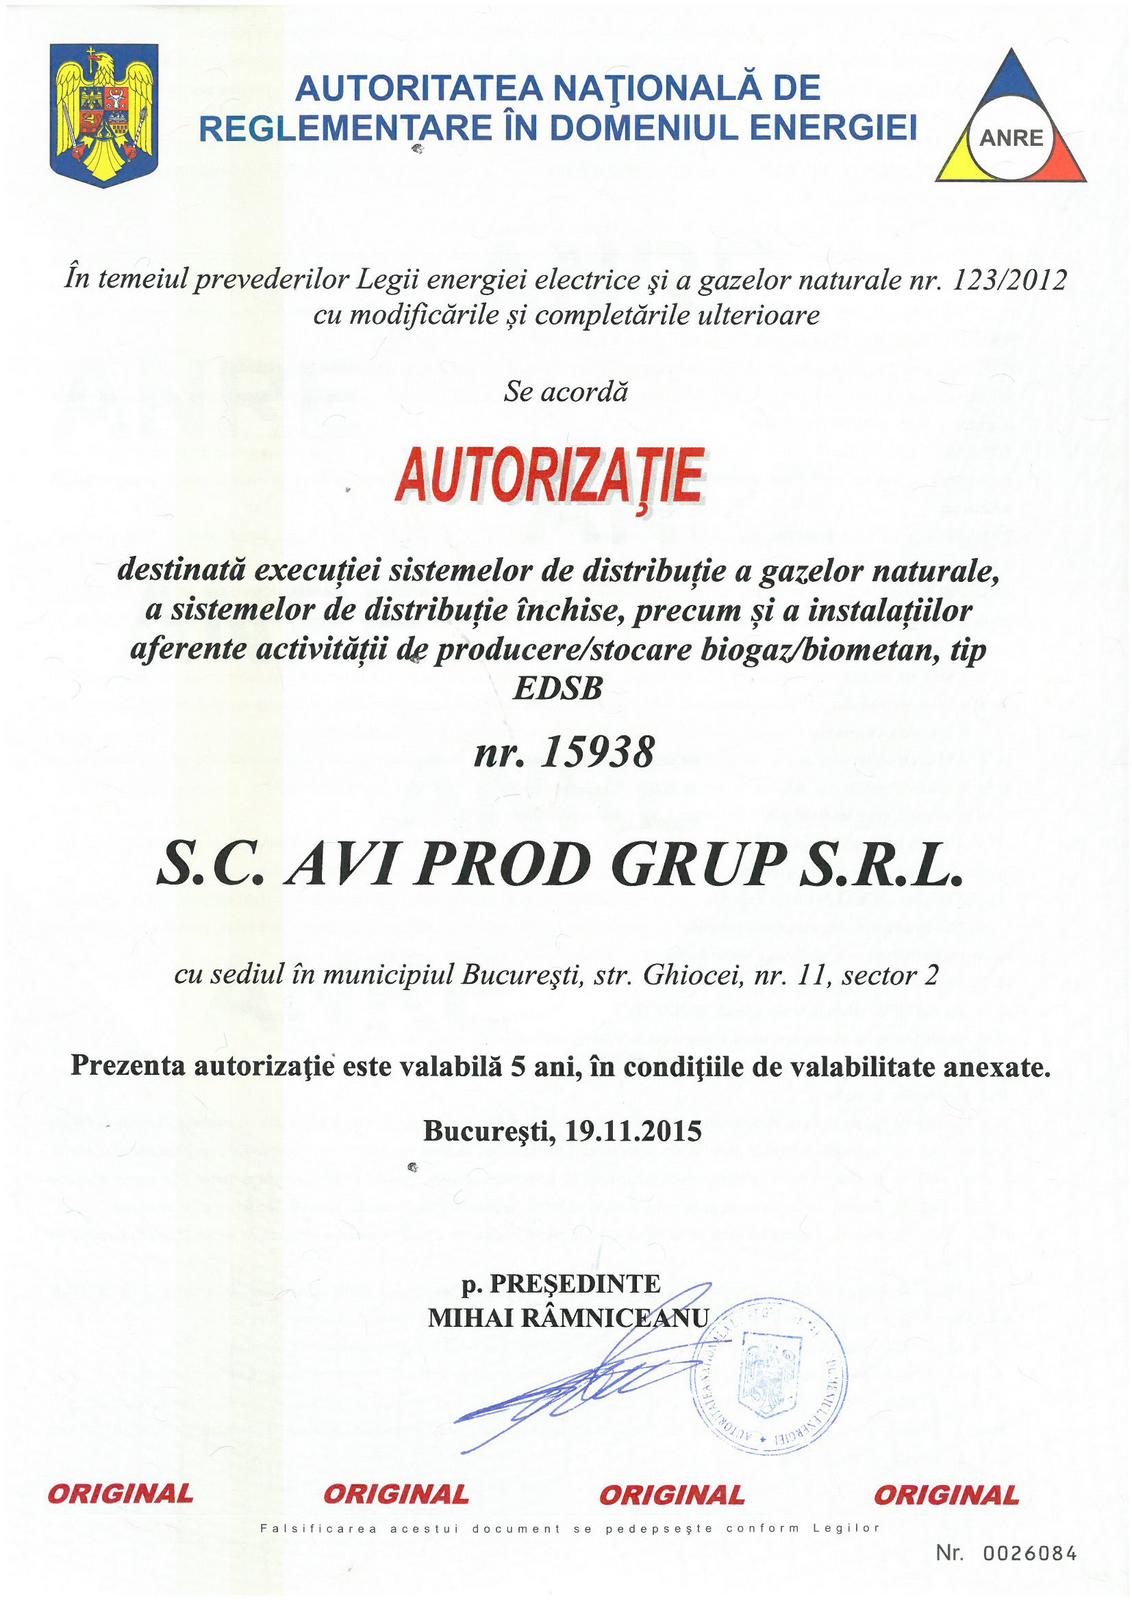 AUTORIZATIIEDSBEDIBVALABILITATE18.11.2020_Page_1